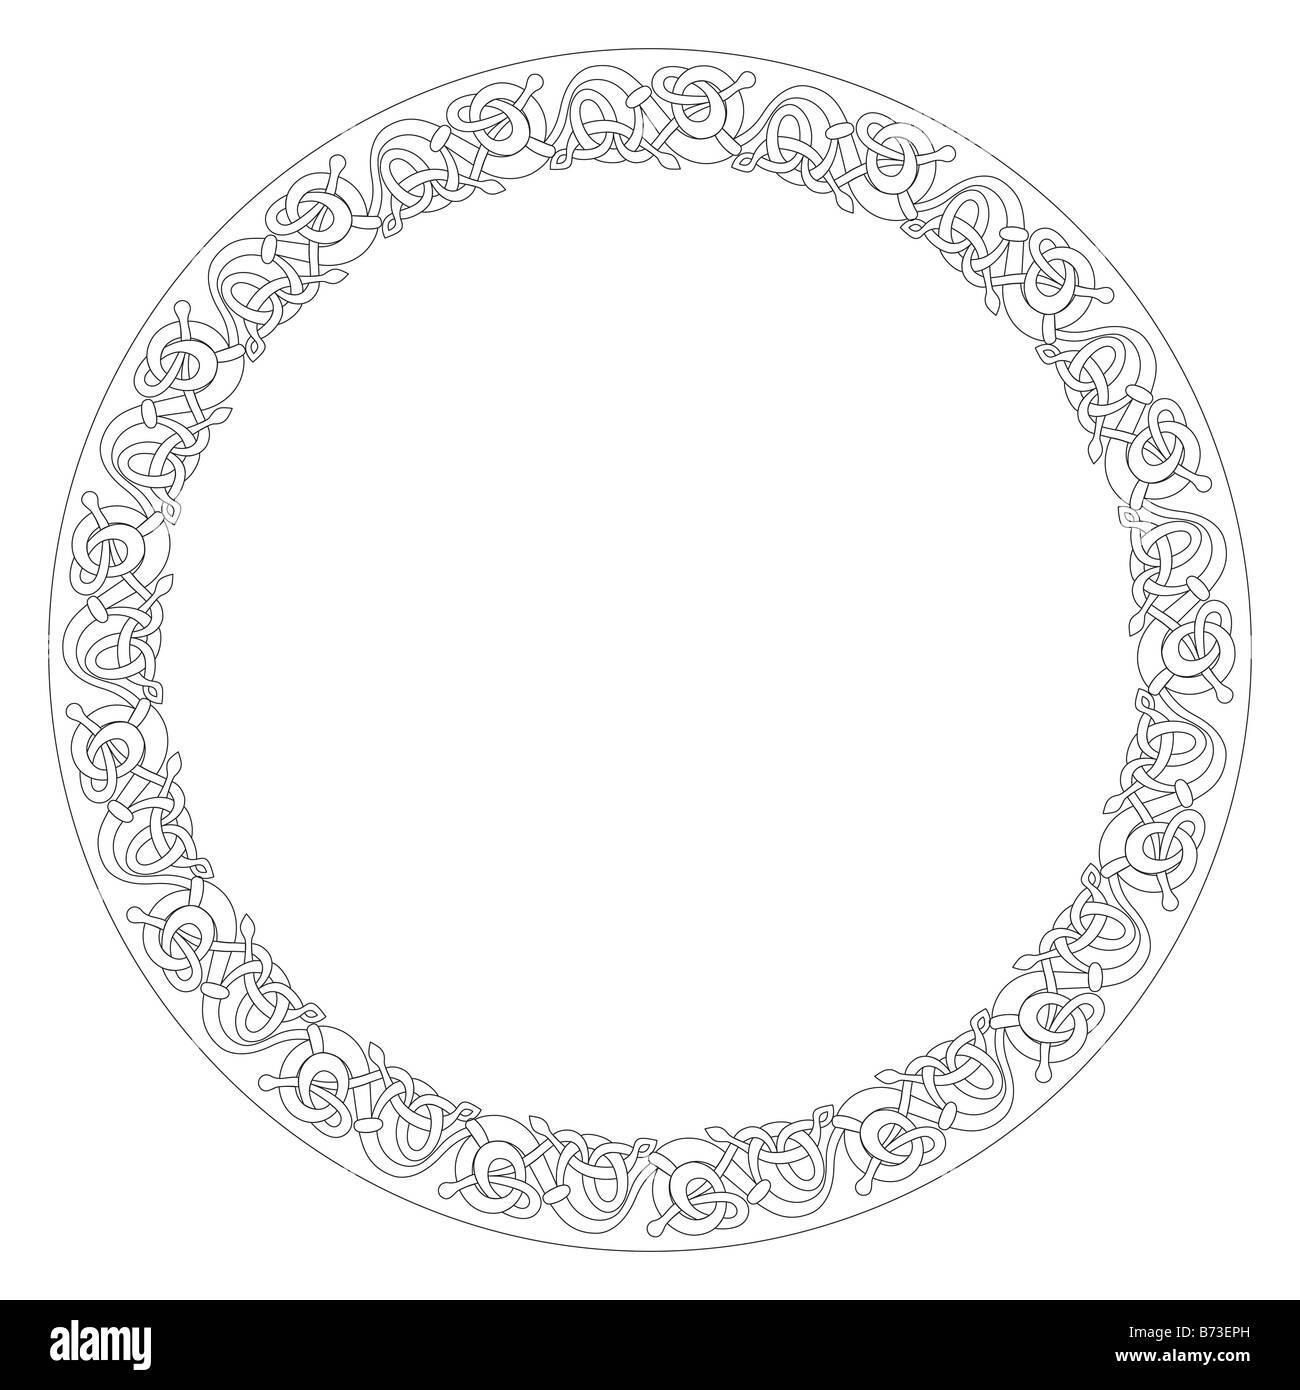 Celtic Knot decorative border - Stock Image